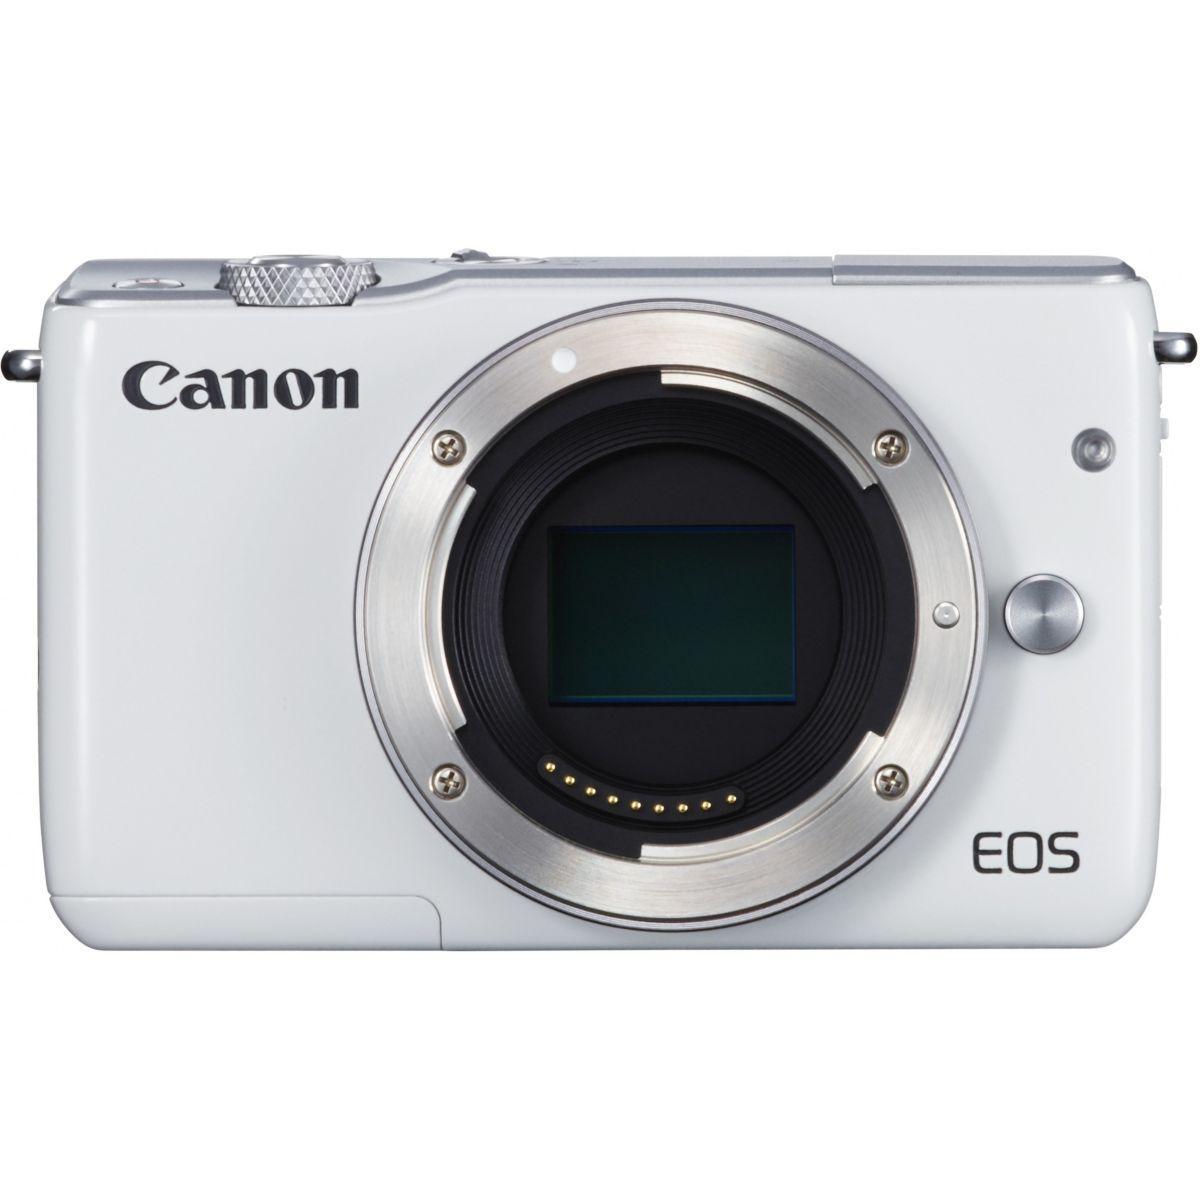 Apn canon eos m10 blanc nu - livraison offerte : code livphoto (photo)